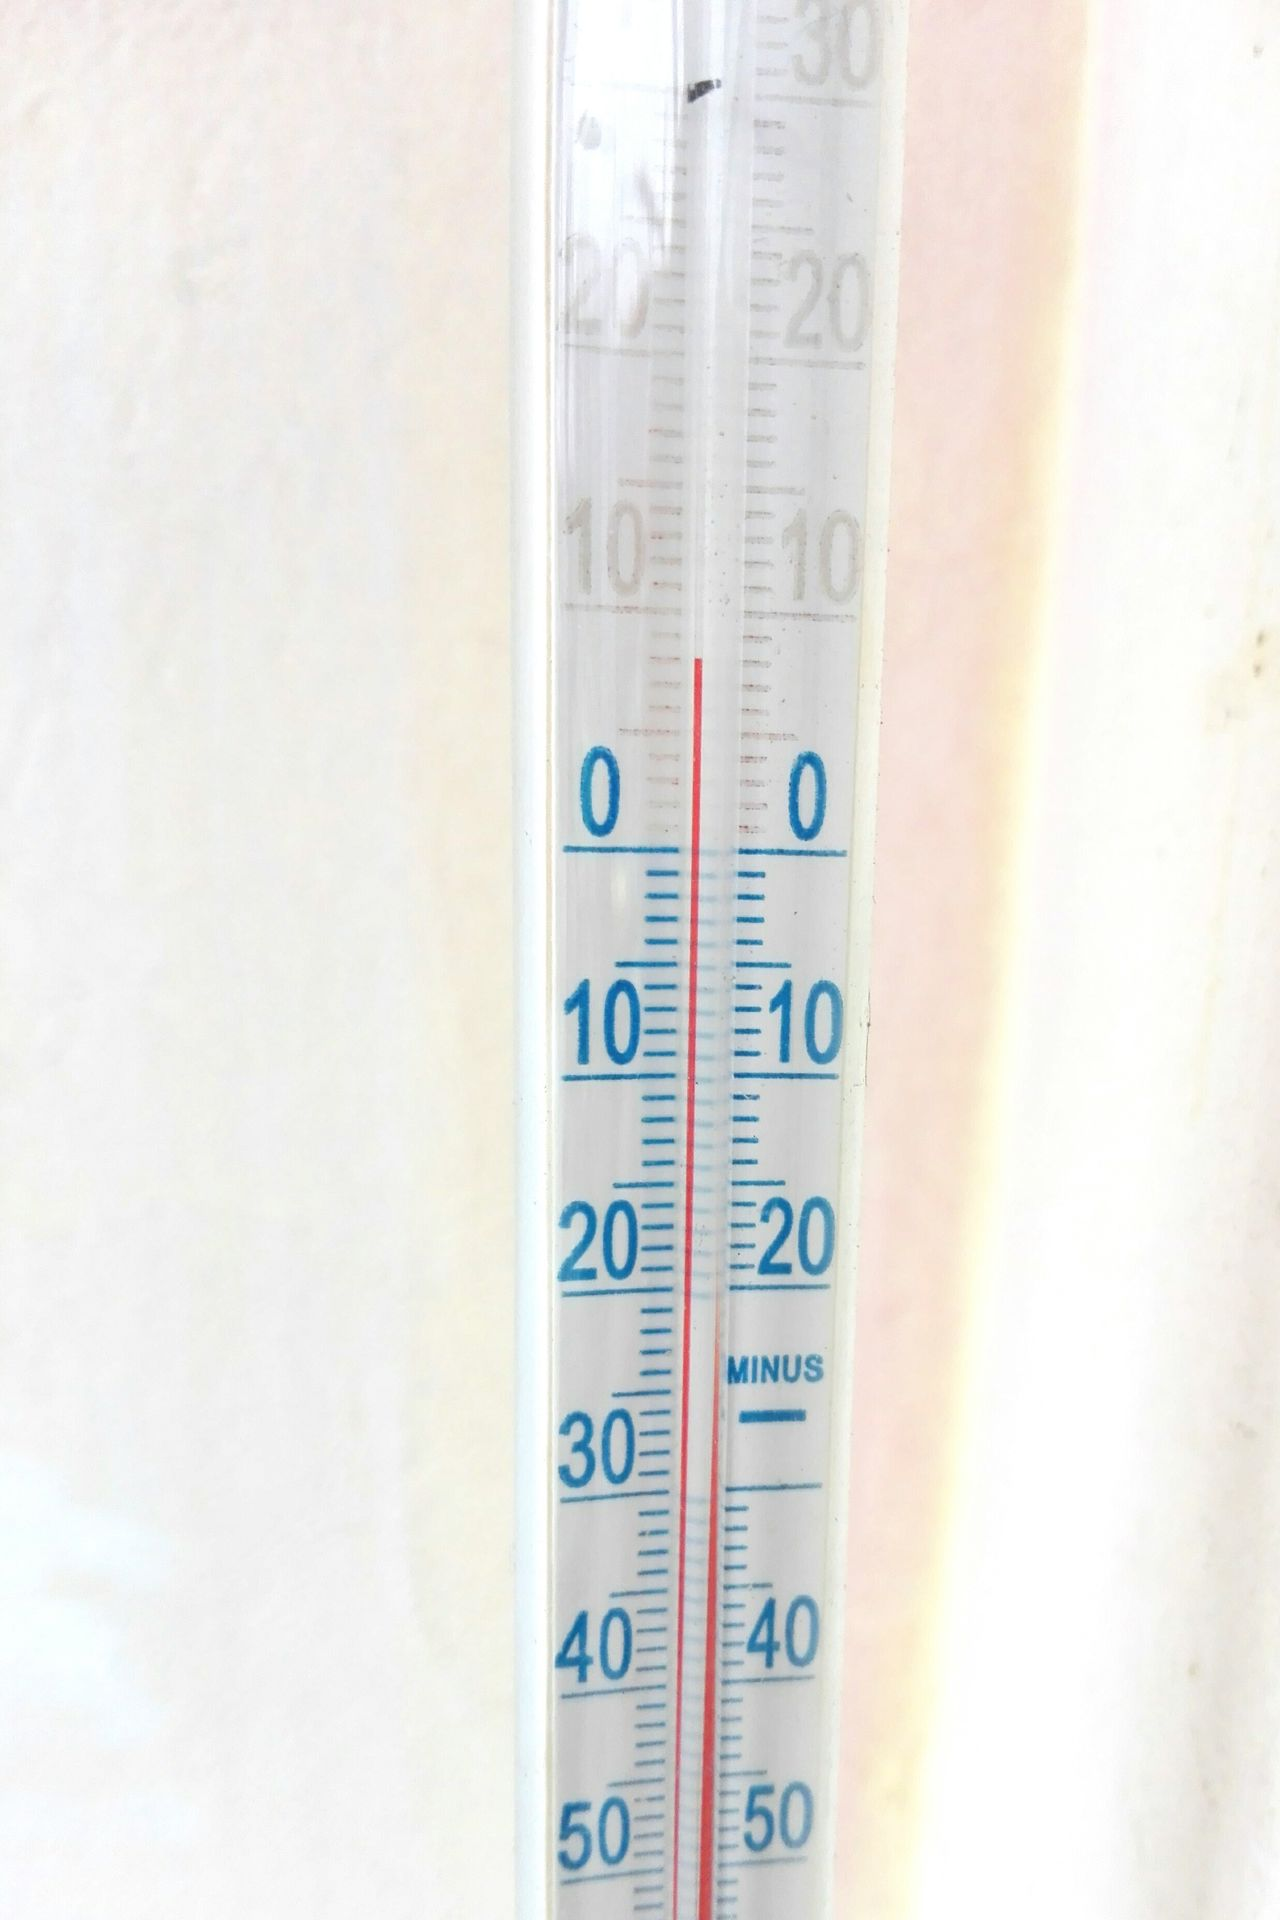 Thermometer No People Healthcare And Medicine Close-up Temperature Veronicaionita Wolfzuachiv @WOLFZUACHiV Romania